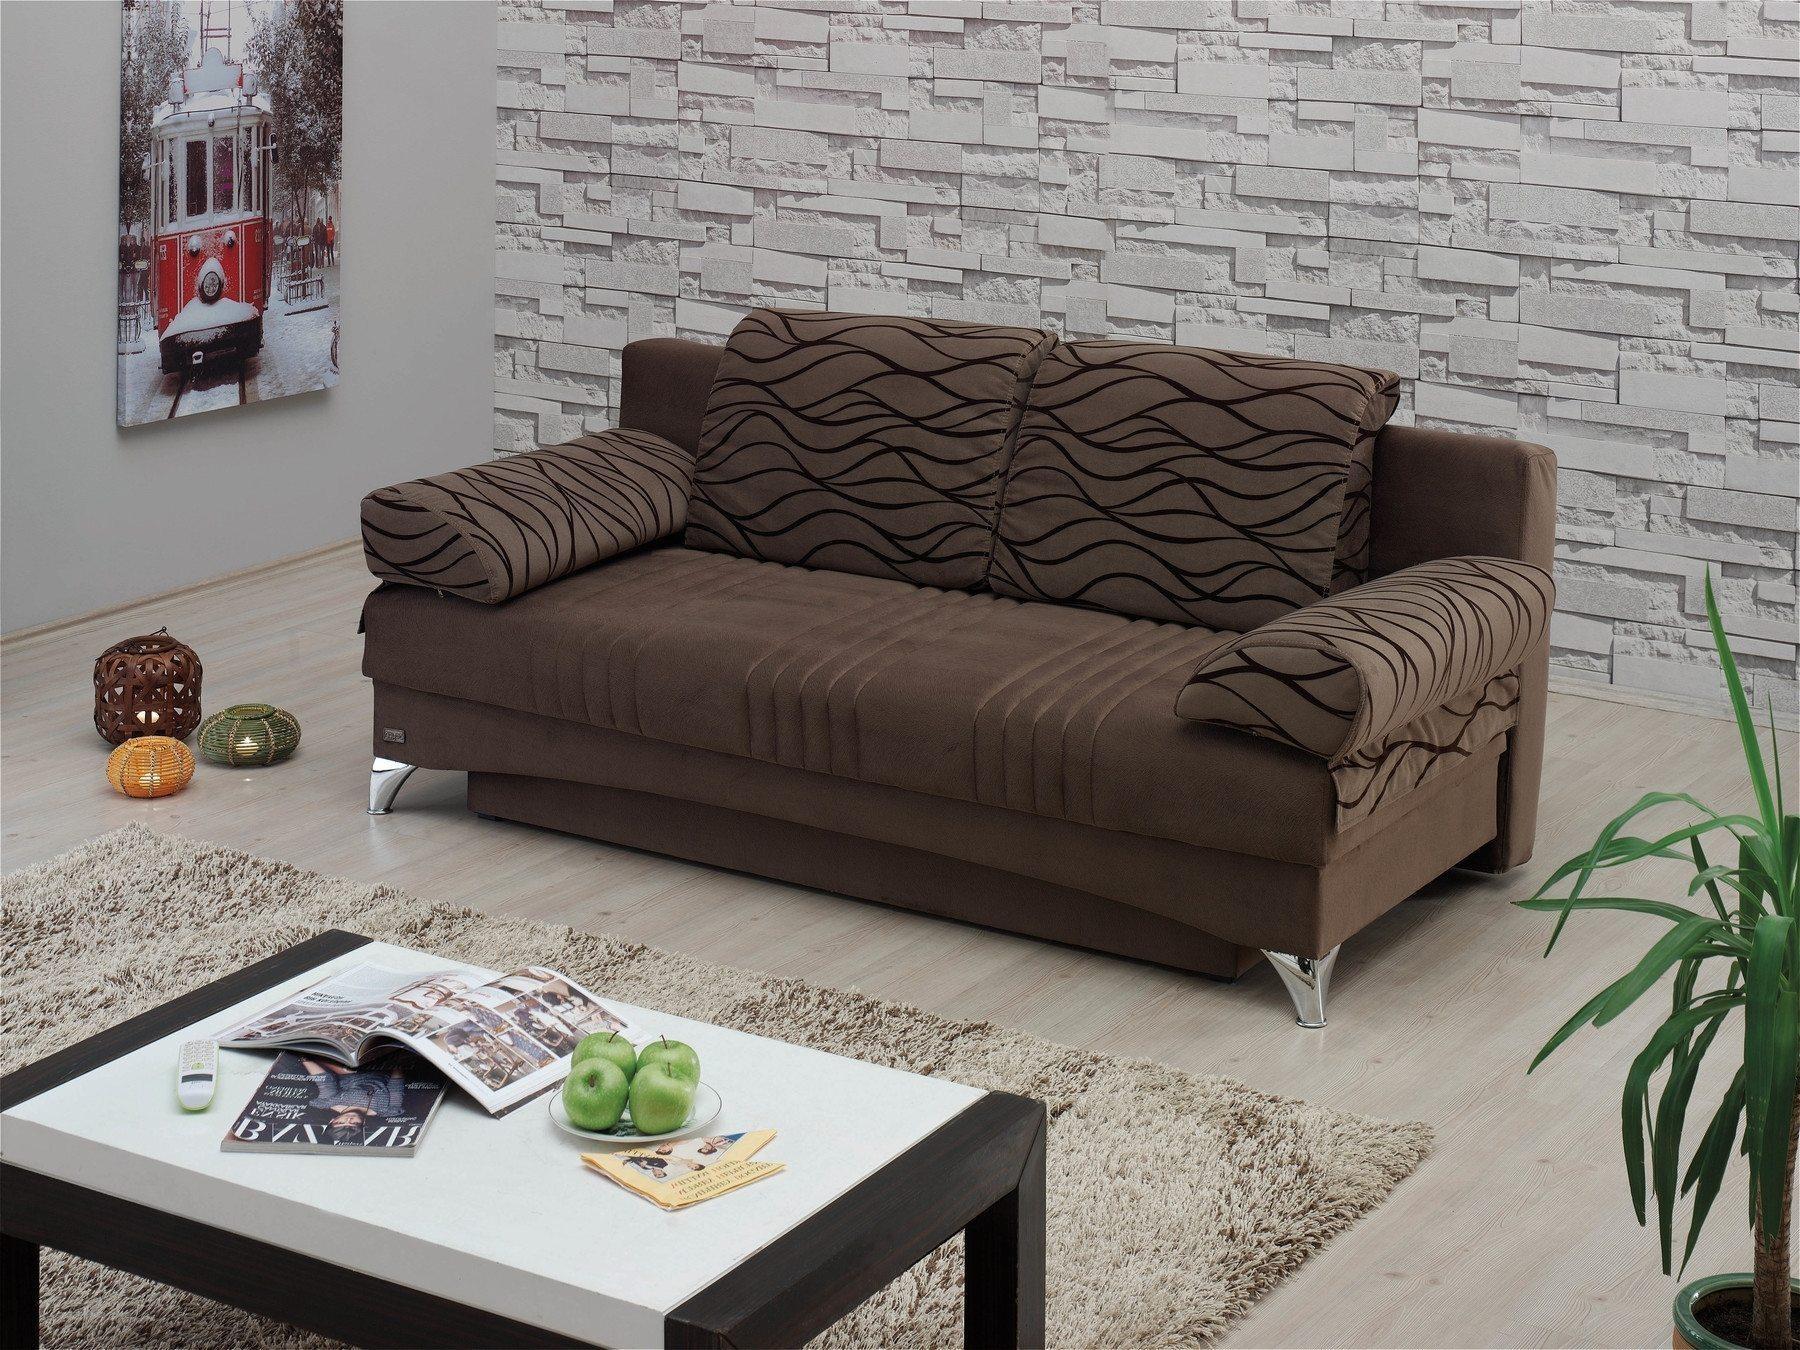 Sleeper Sofa San Diego With Ideas Inspiration 17852 | Kengire Pertaining To Sleeper Sofas San Diego (Image 16 of 20)